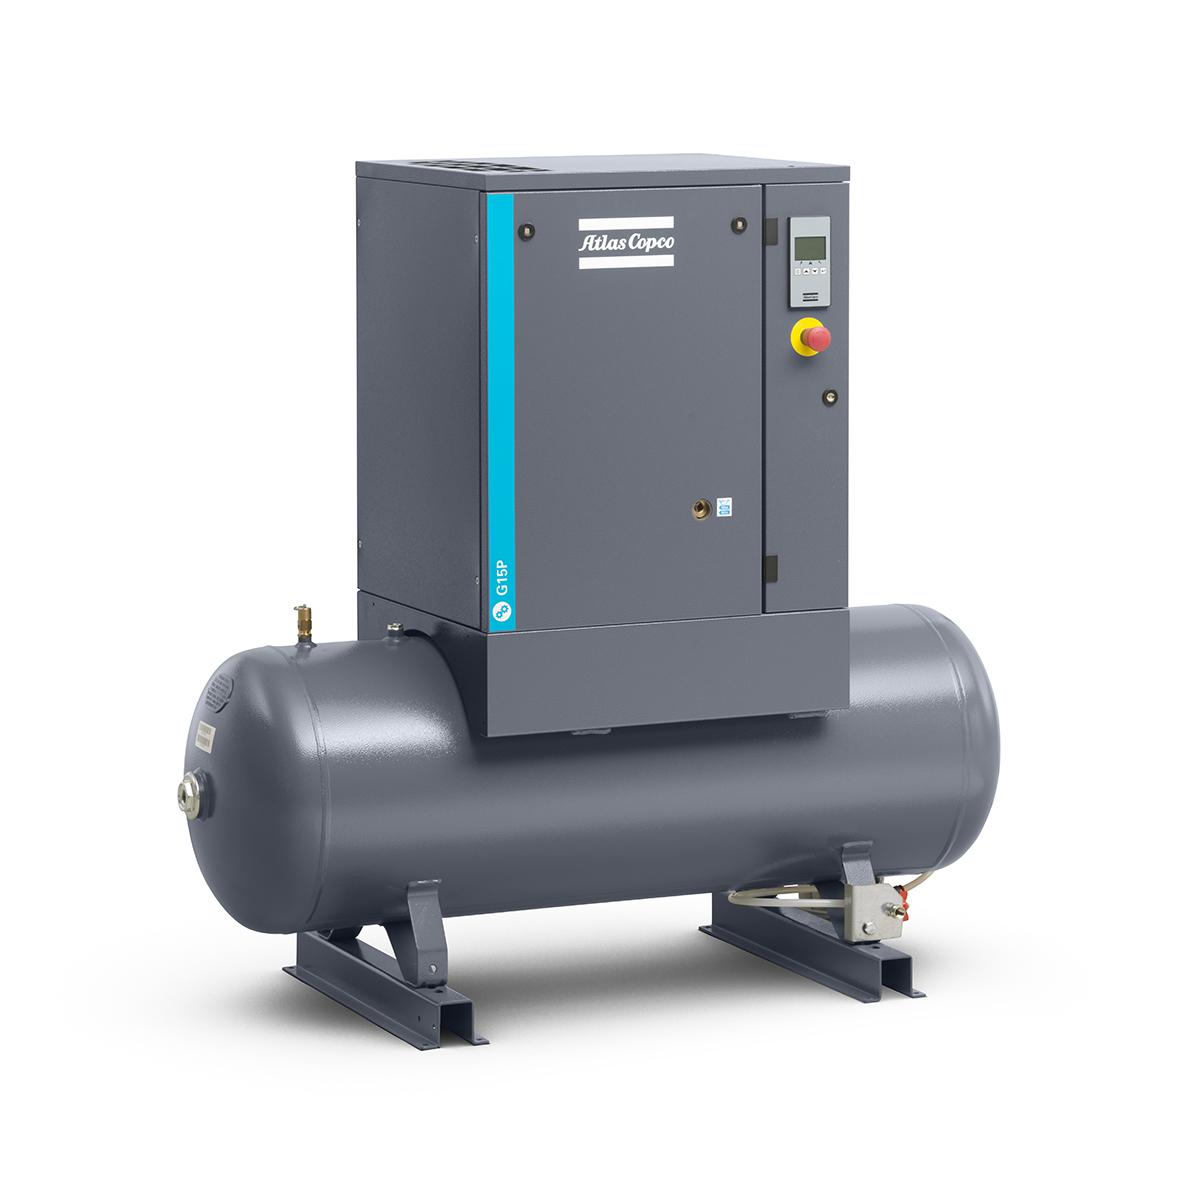 Screw Air Compressor - Model 15kW Screw Compressor G15P 7.5 BAR